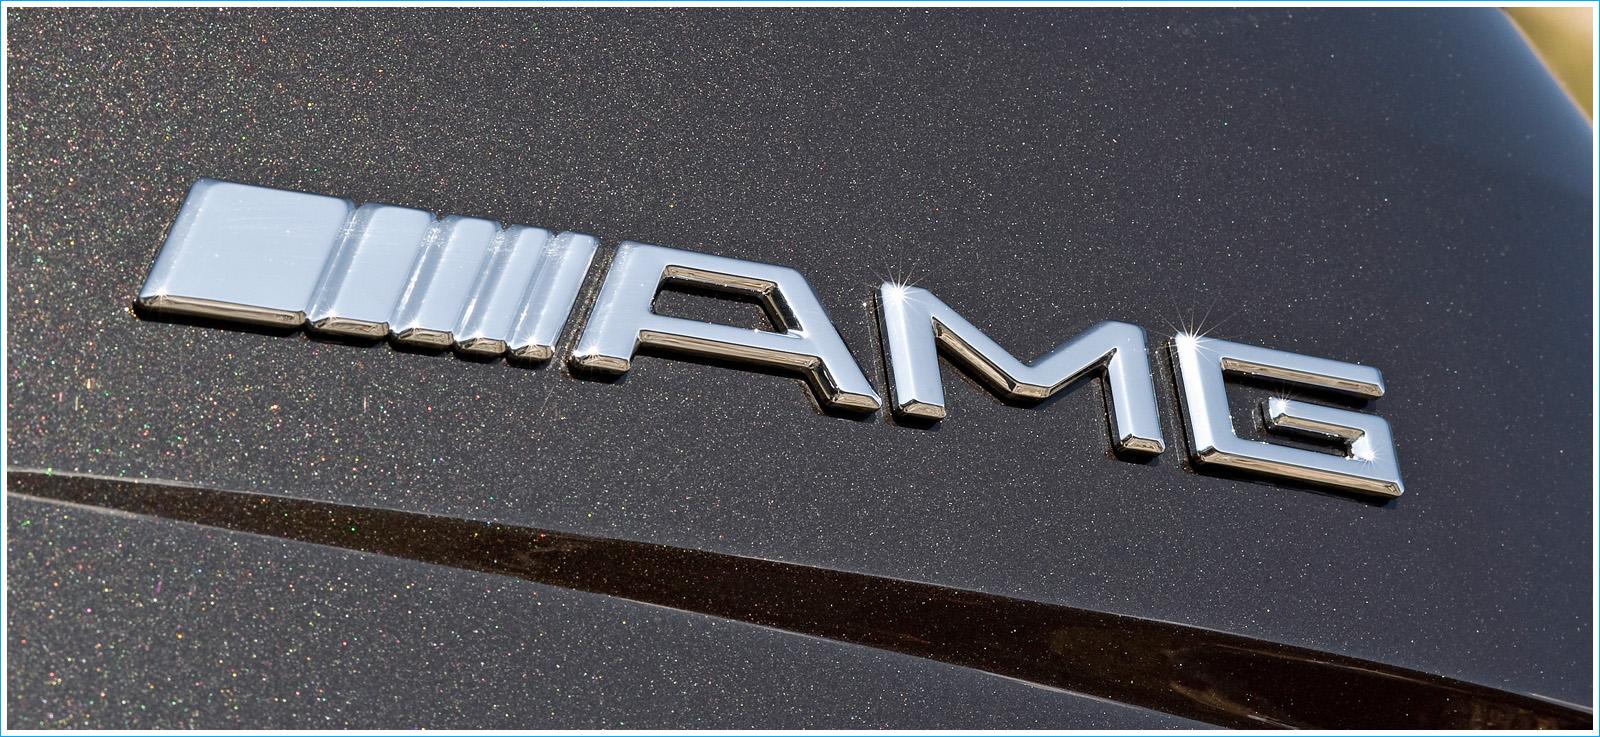 Le logo mercedes benz les marques de voitures for Mercedes benz amg emblem